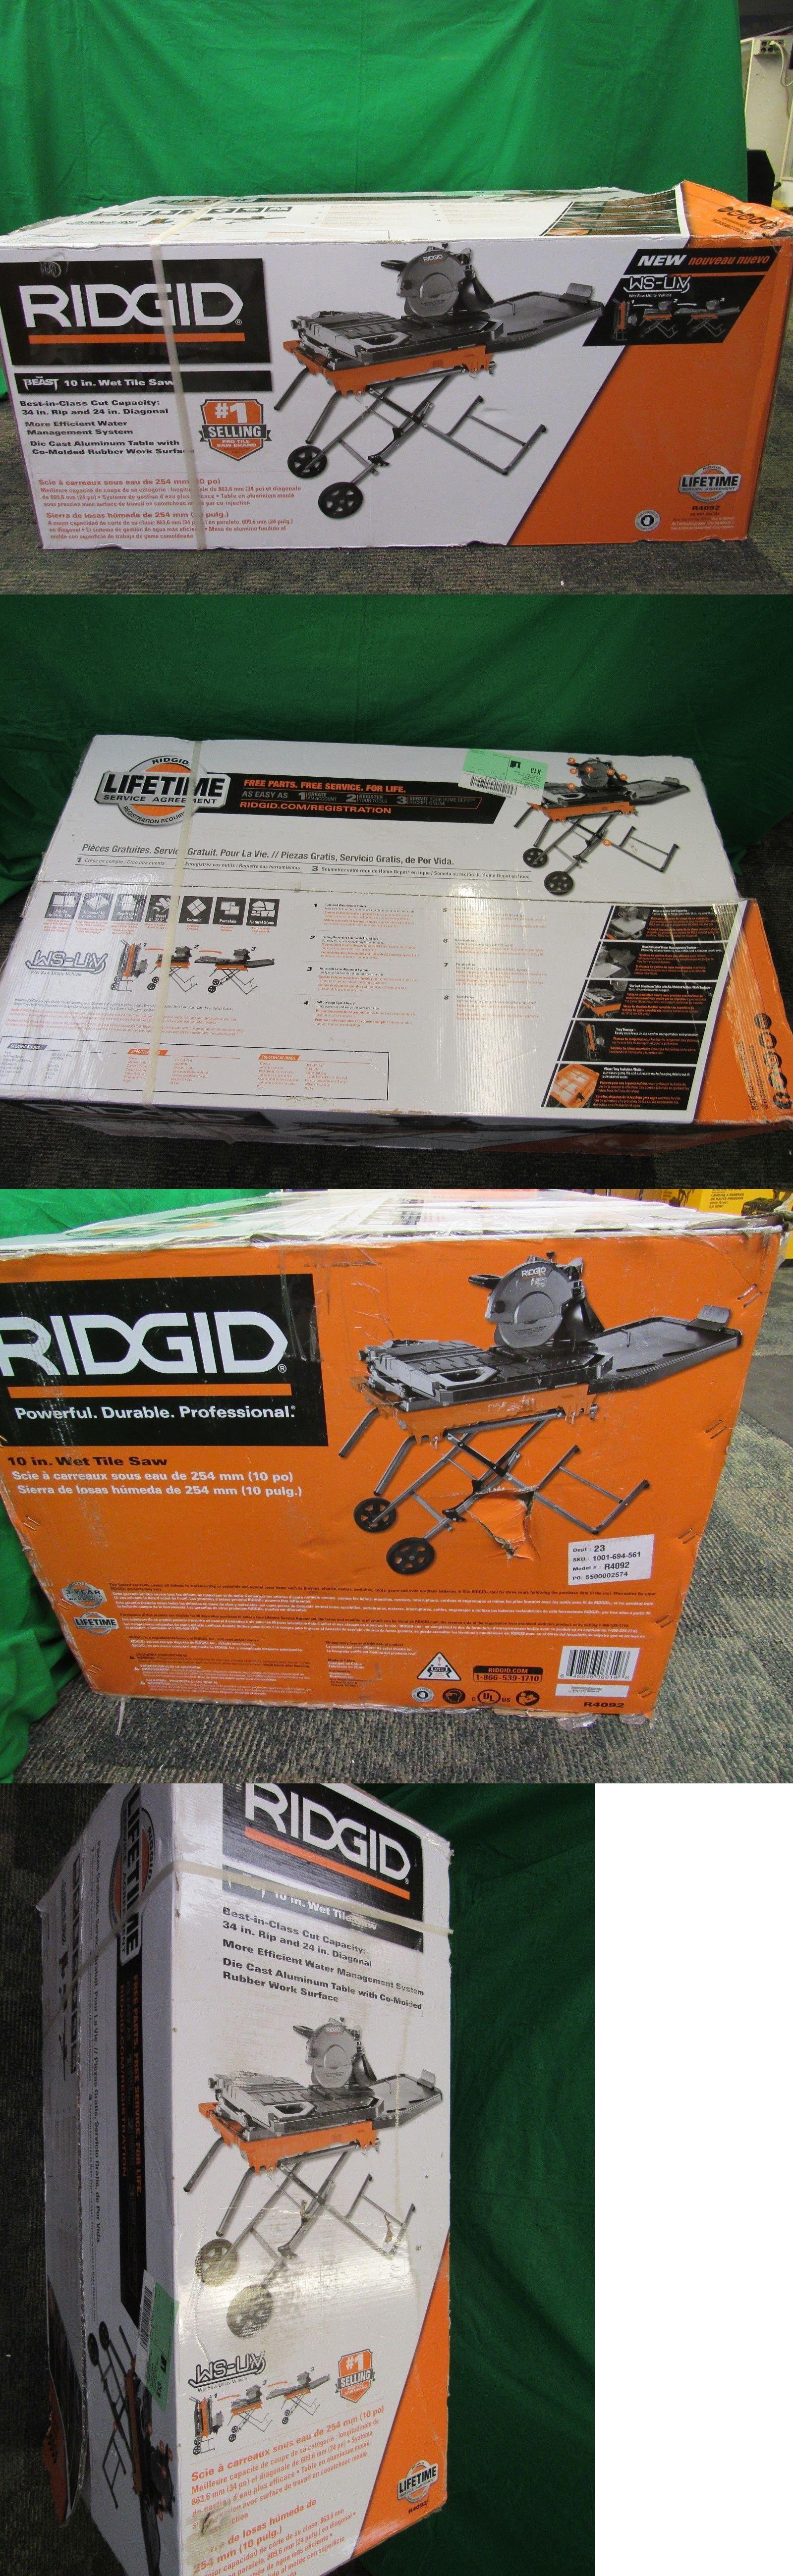 ridgid r4092 the beast 10 wet tile saw